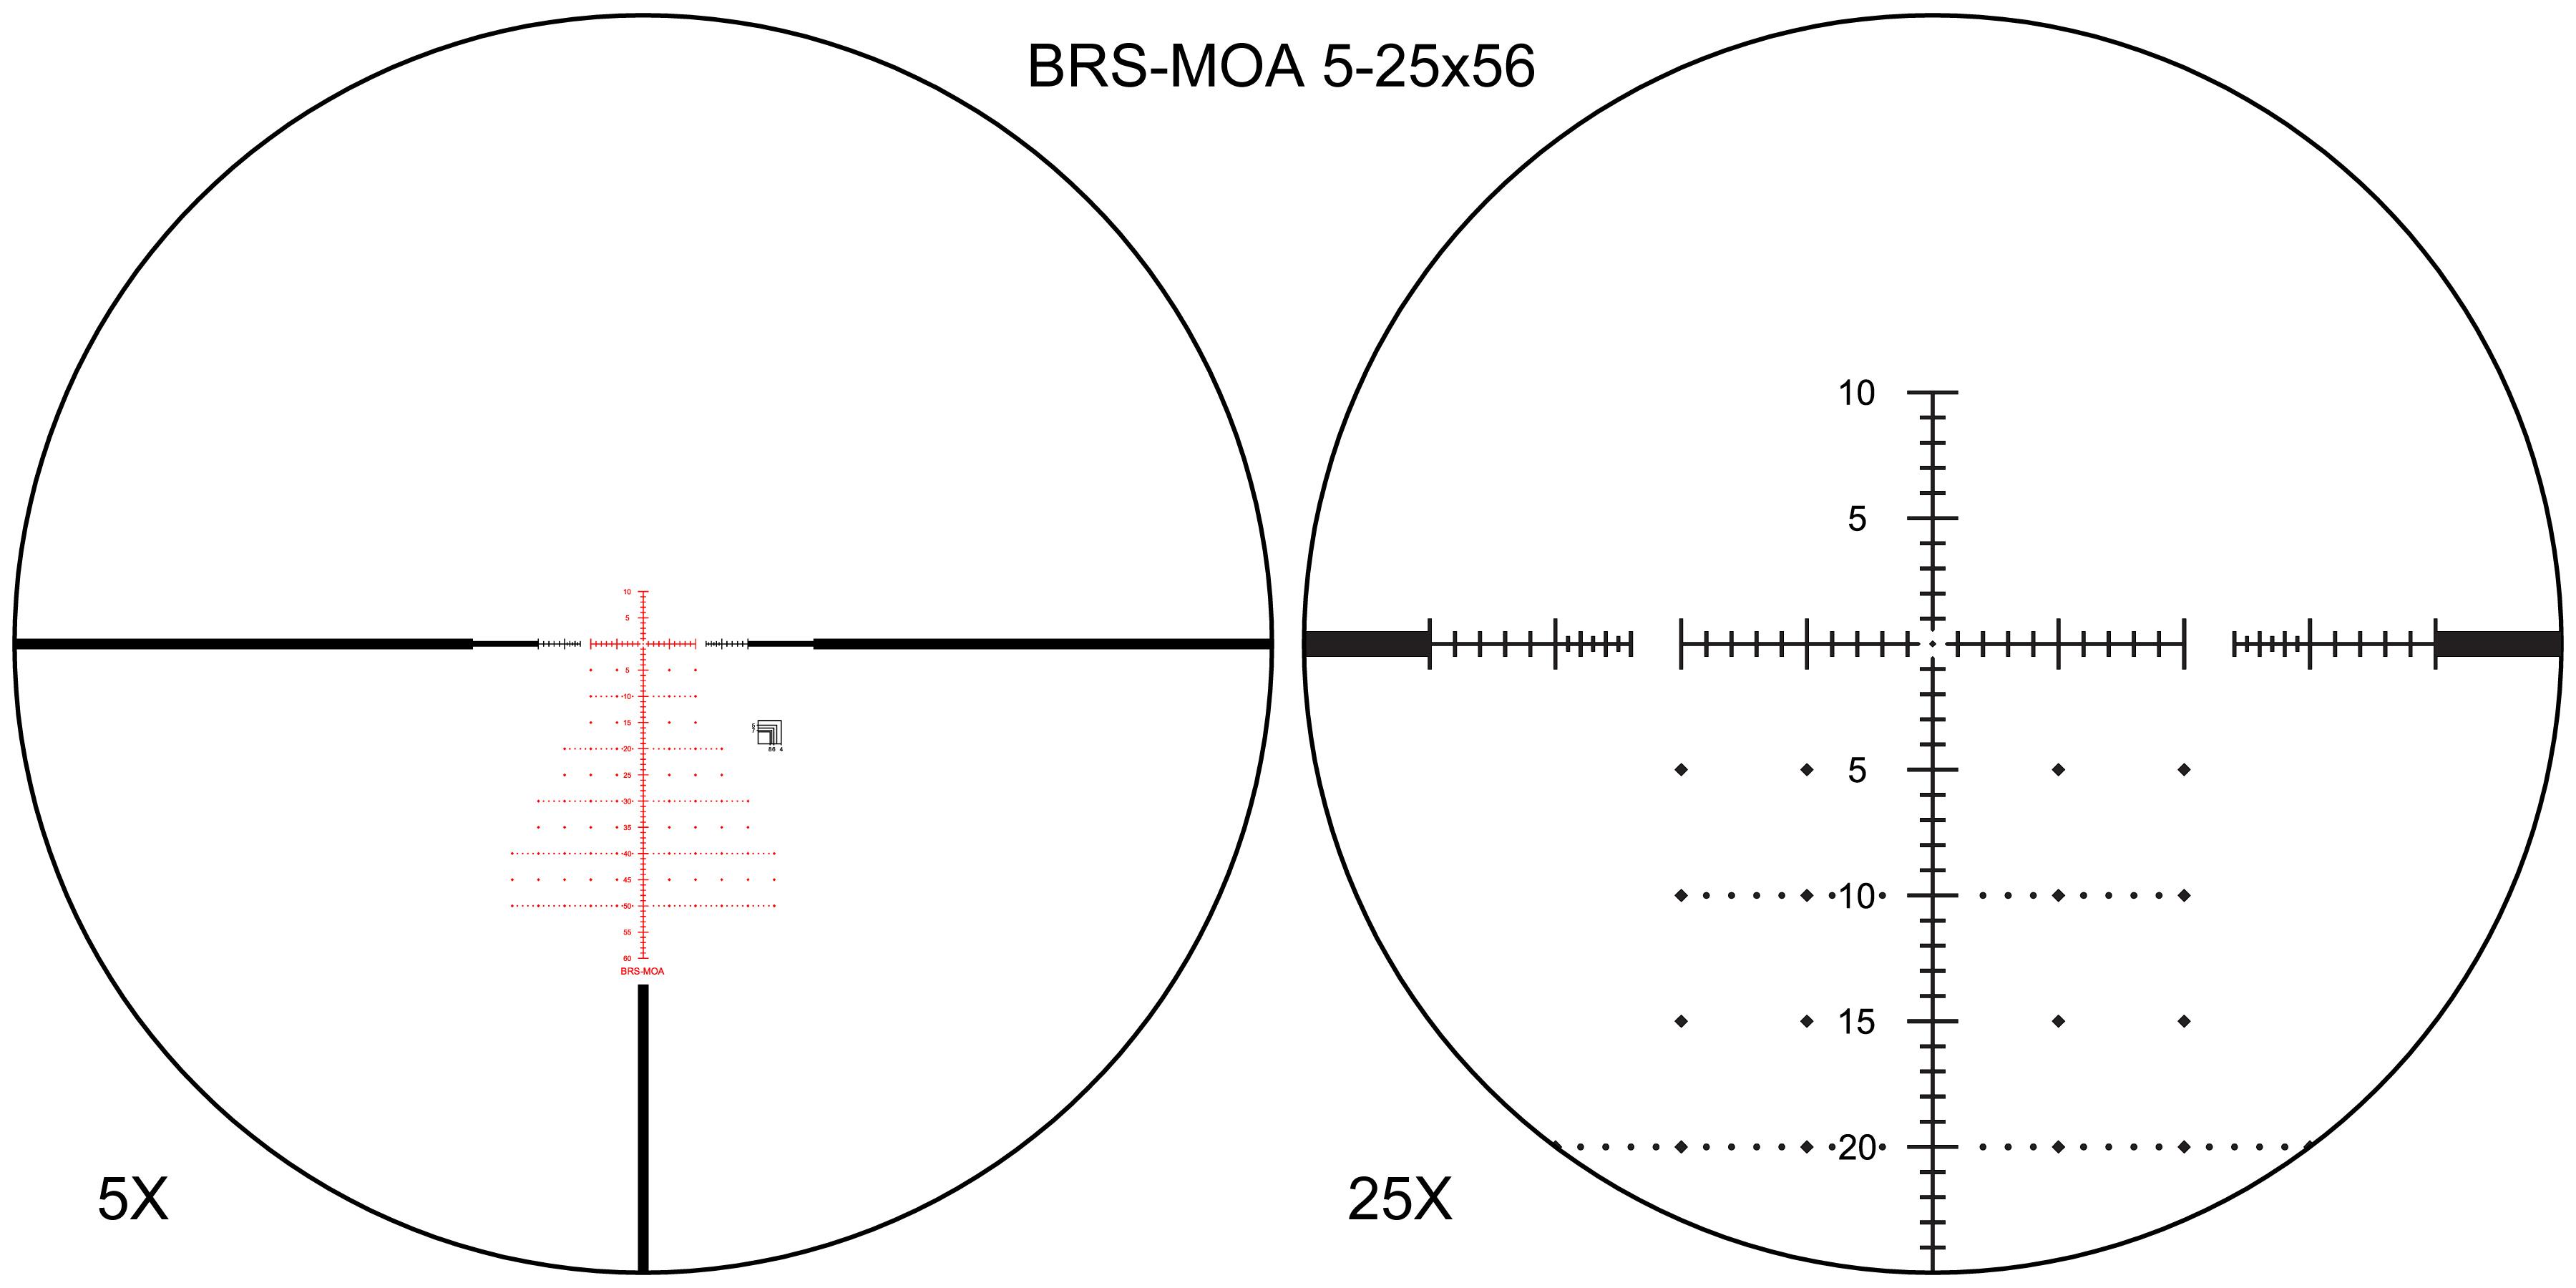 5-25×56 BRS-MOA